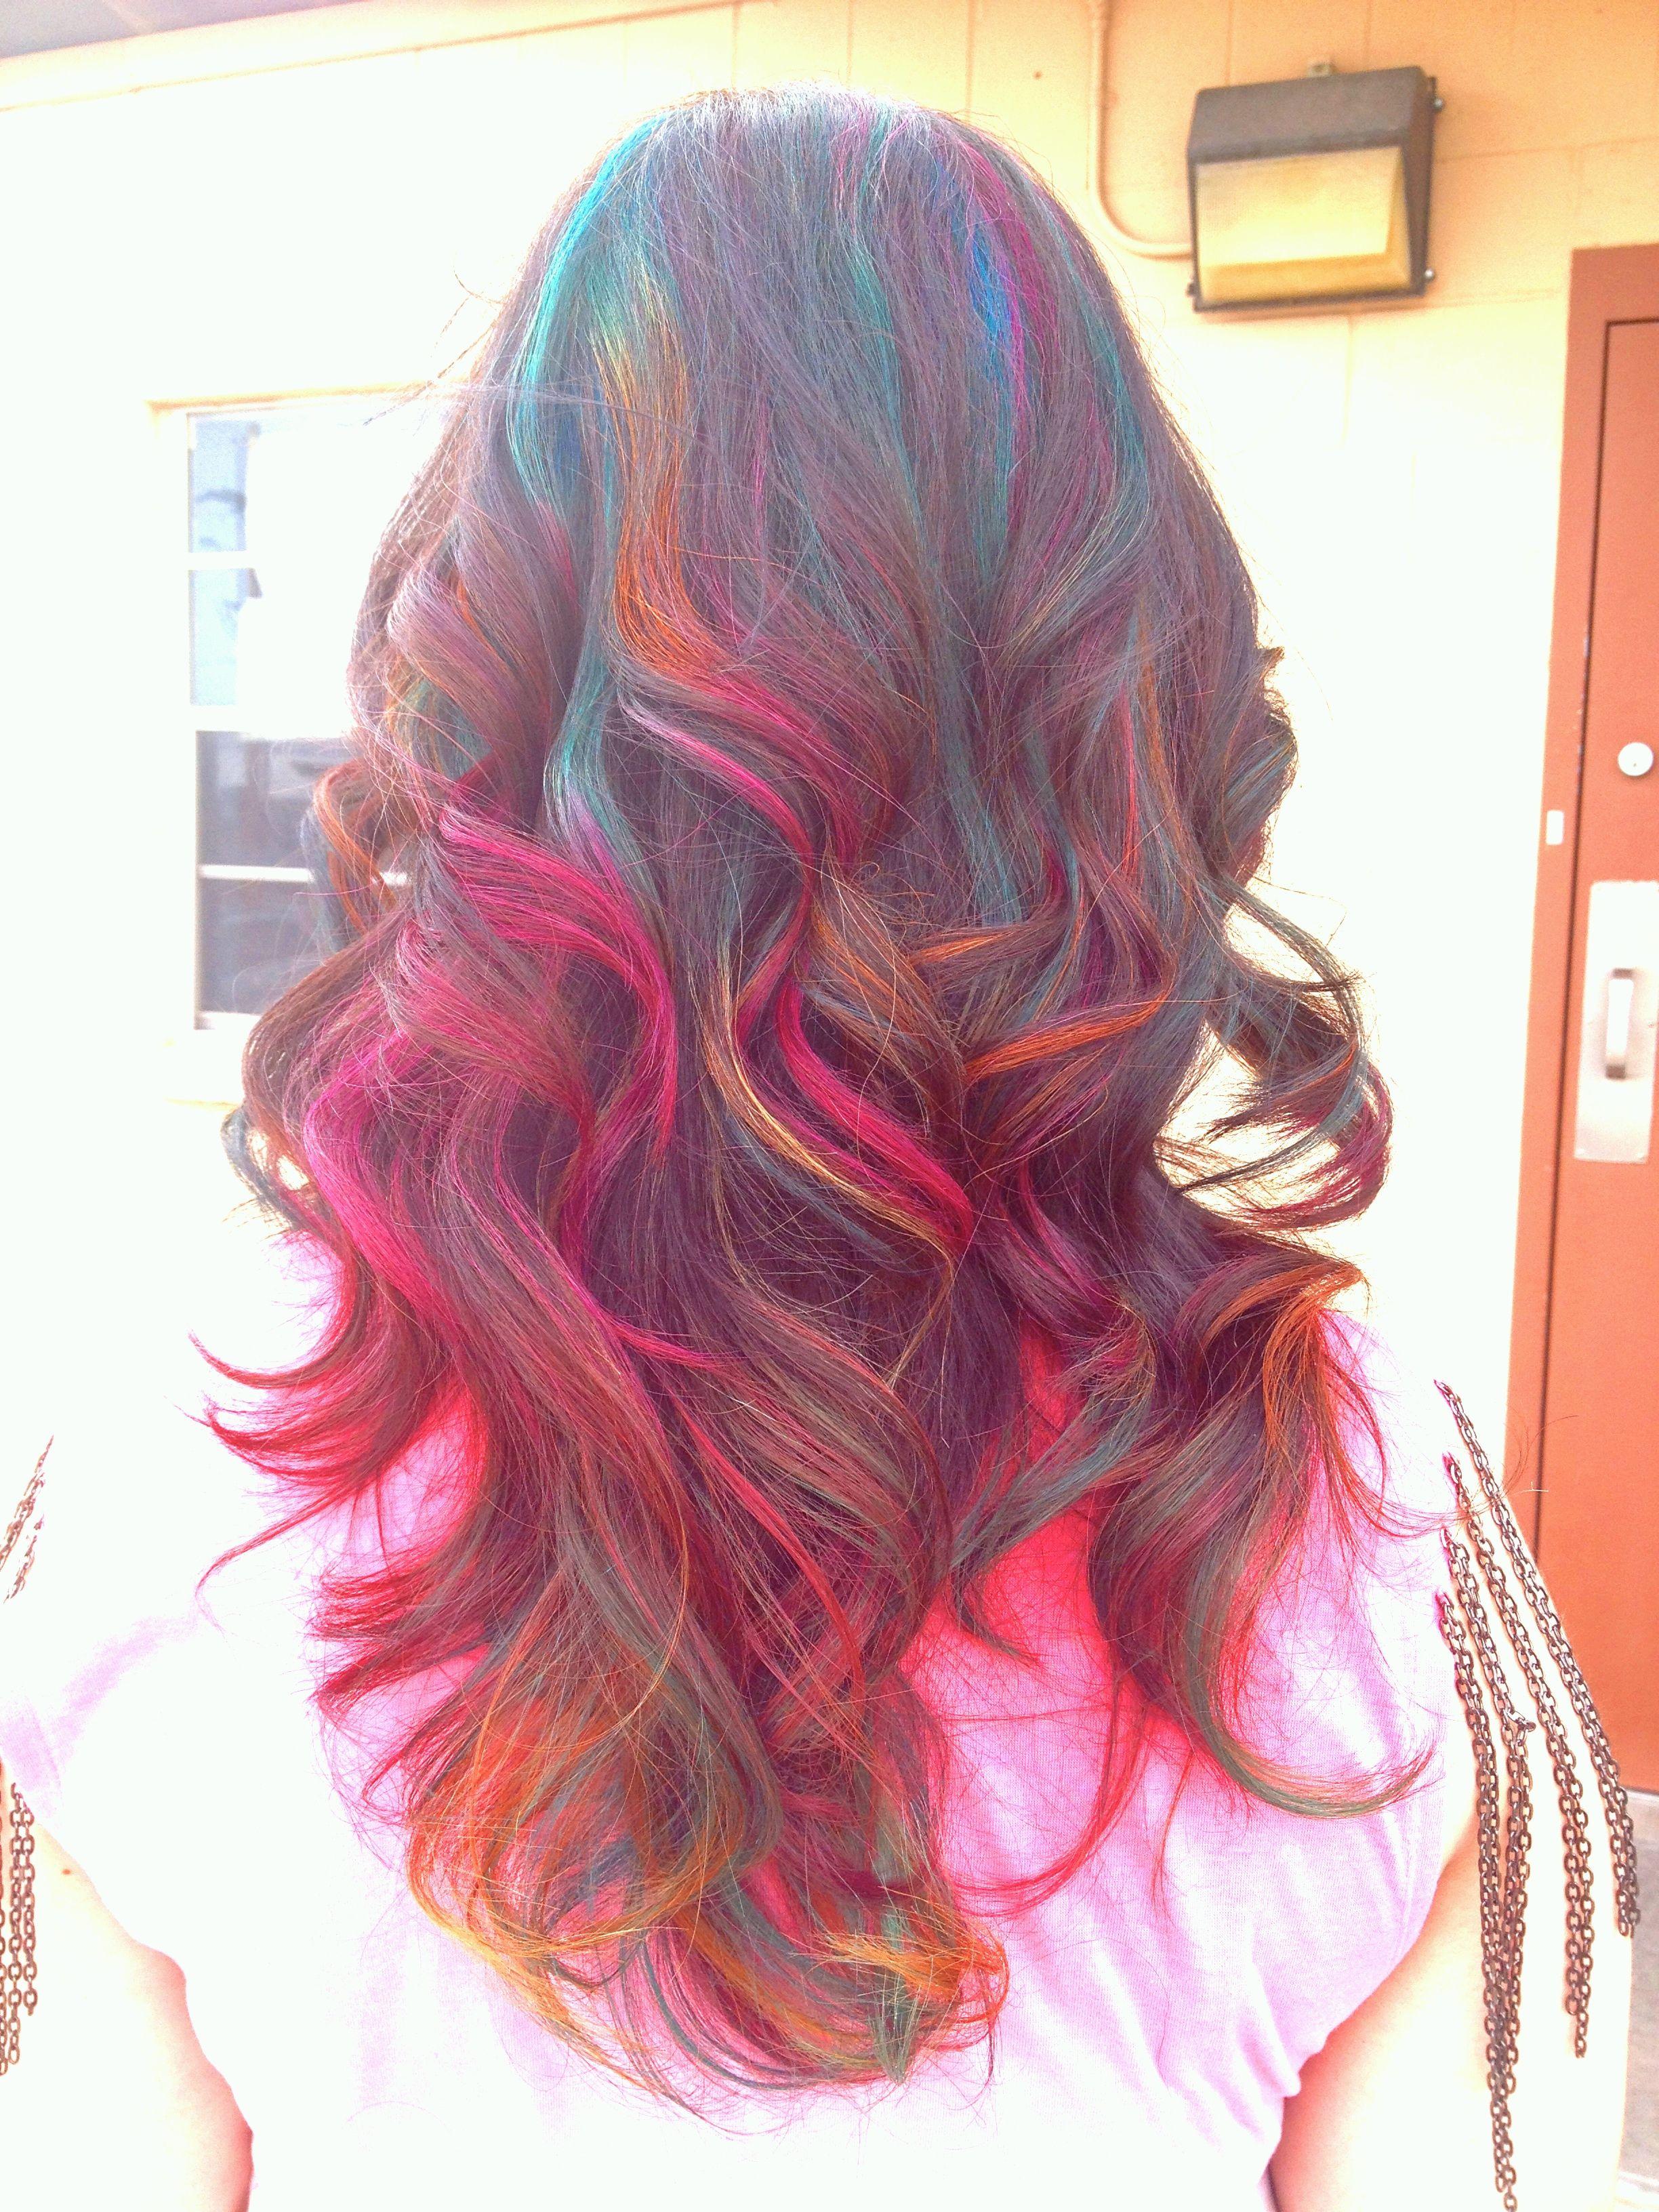 I LOVE my new rainbow highlights! My stylist used teal, pink, blue ...